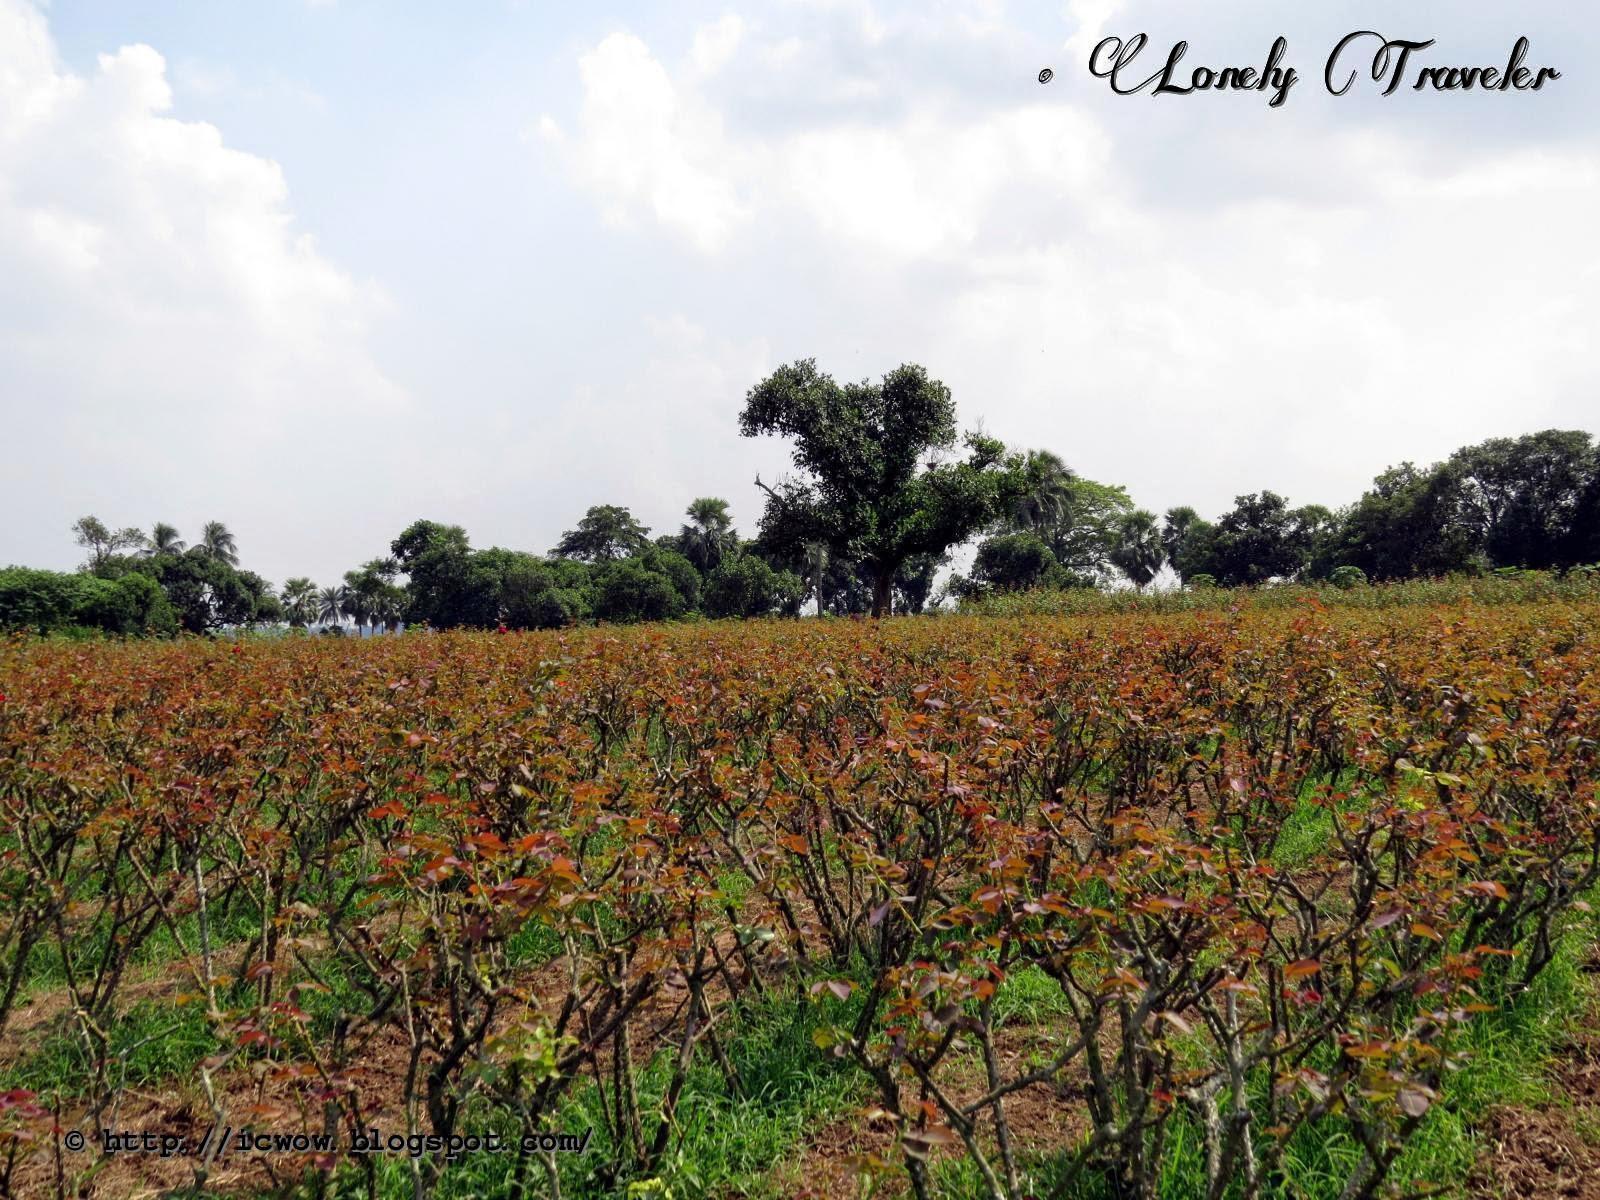 Dhaka: Flower Cultivation at Sadullapur | Lonely Traveler